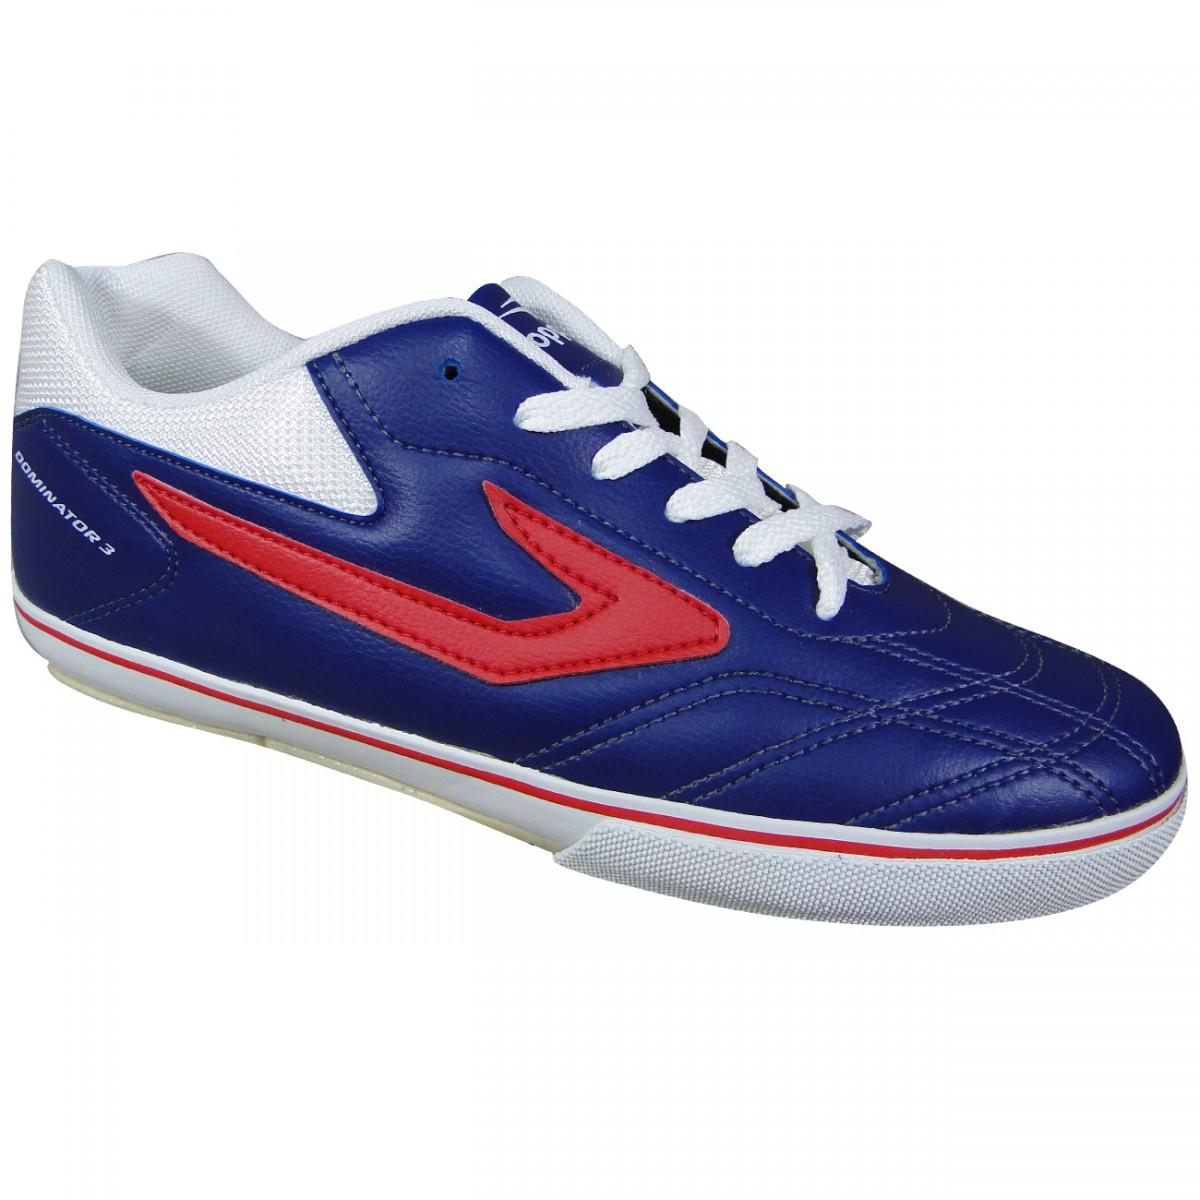 80dbfd4d2a Tenis Topper Dominator III Futsal 4132751 464 - MARINHO VERMELHO BRANCO -  Chuteira Nike